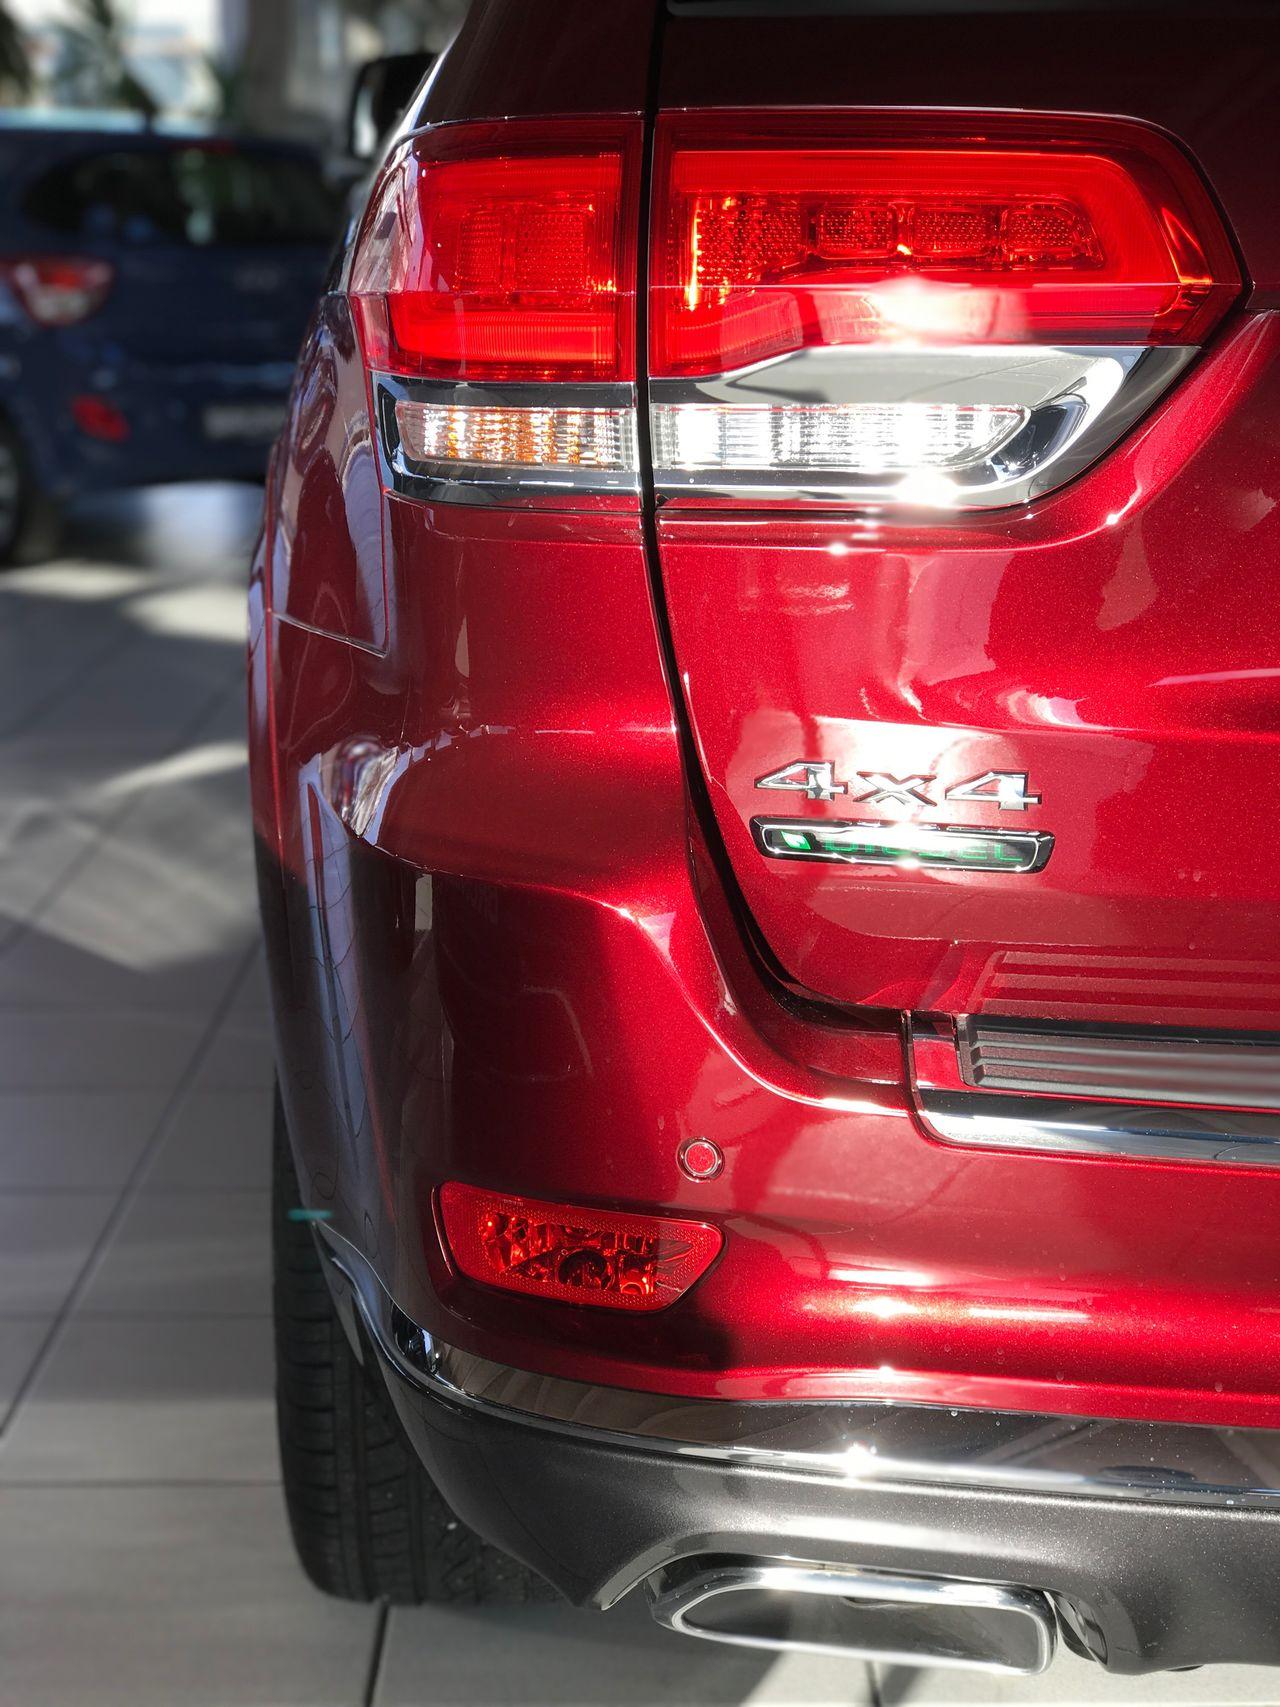 Jeep Grand Cherokee Car Land Vehicle Vehicle Light